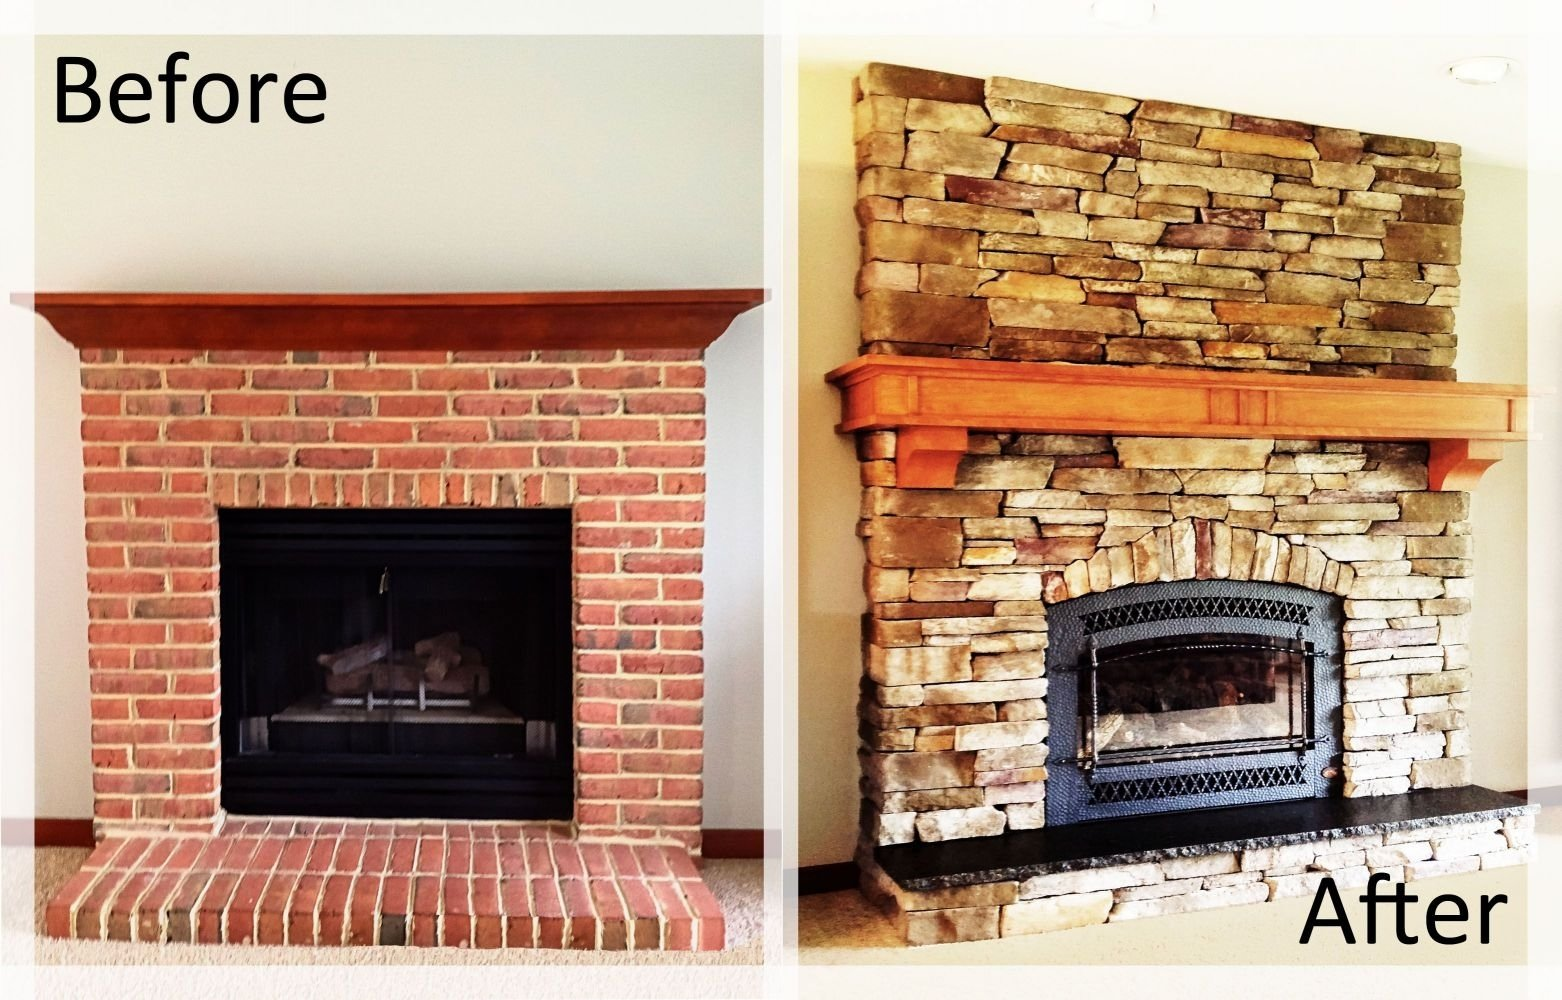 10 Unique Mantel Ideas For Brick Fireplace inspiring white brick fireplace decorating ideas decor image of 2020